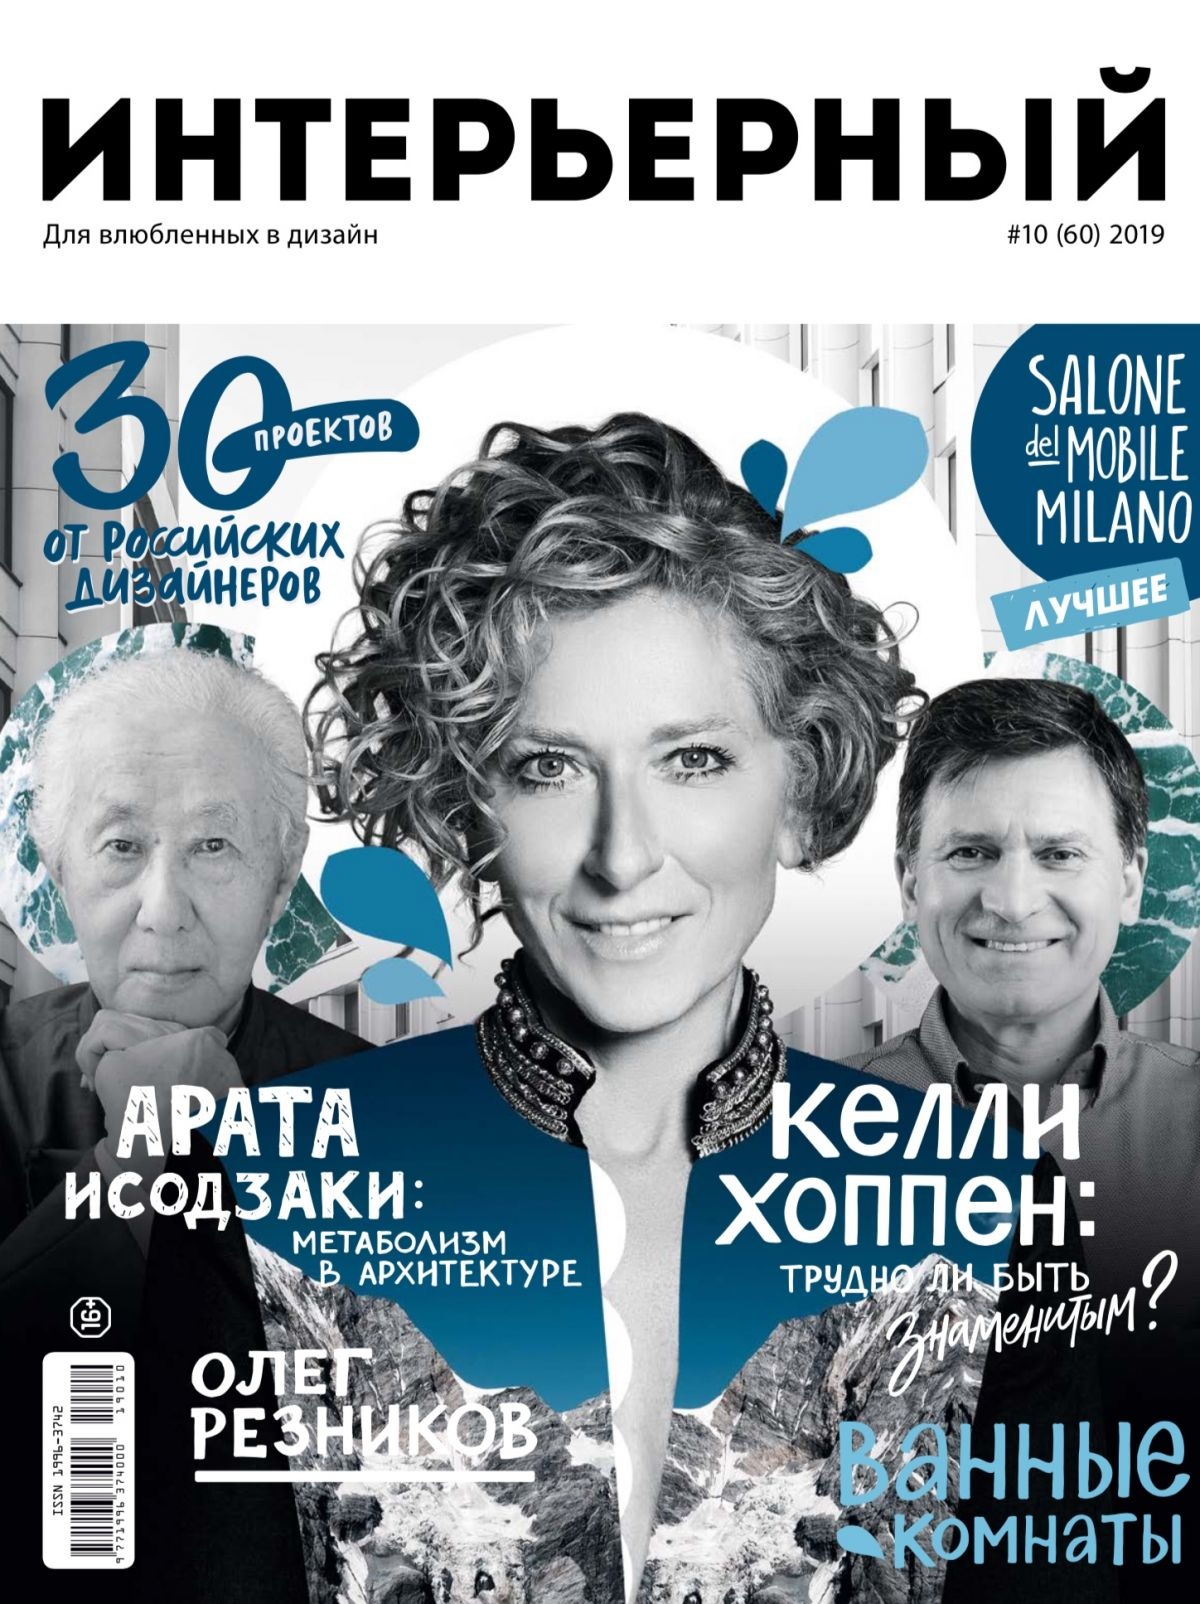 "Журнал ""Интерьерный"" № 10 (60) 2019"